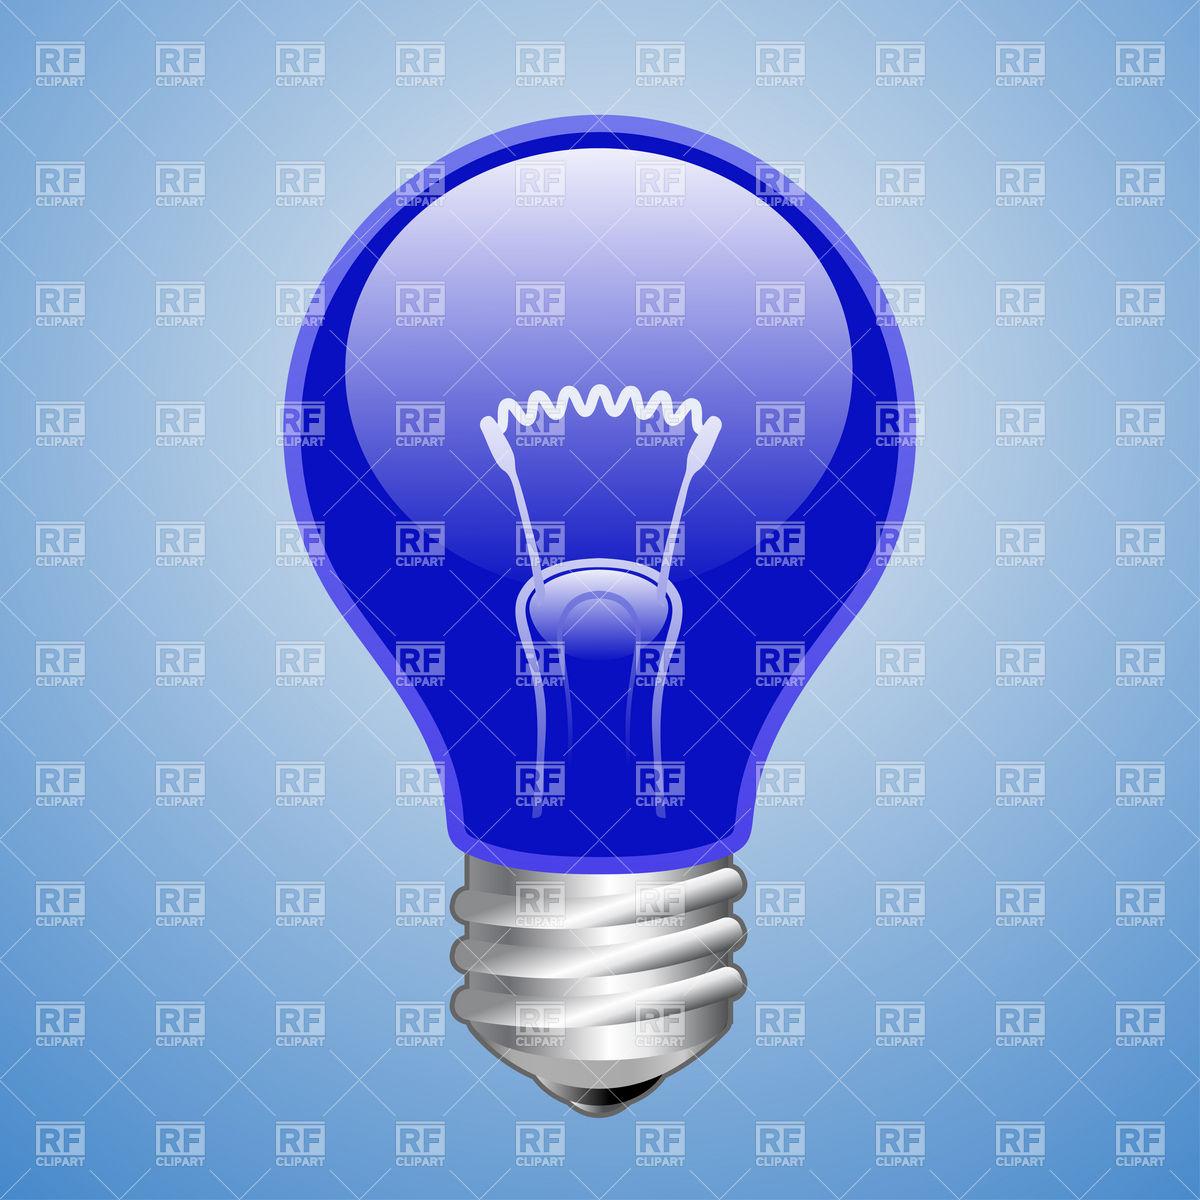 Blue light bulb Vector Image #5790.